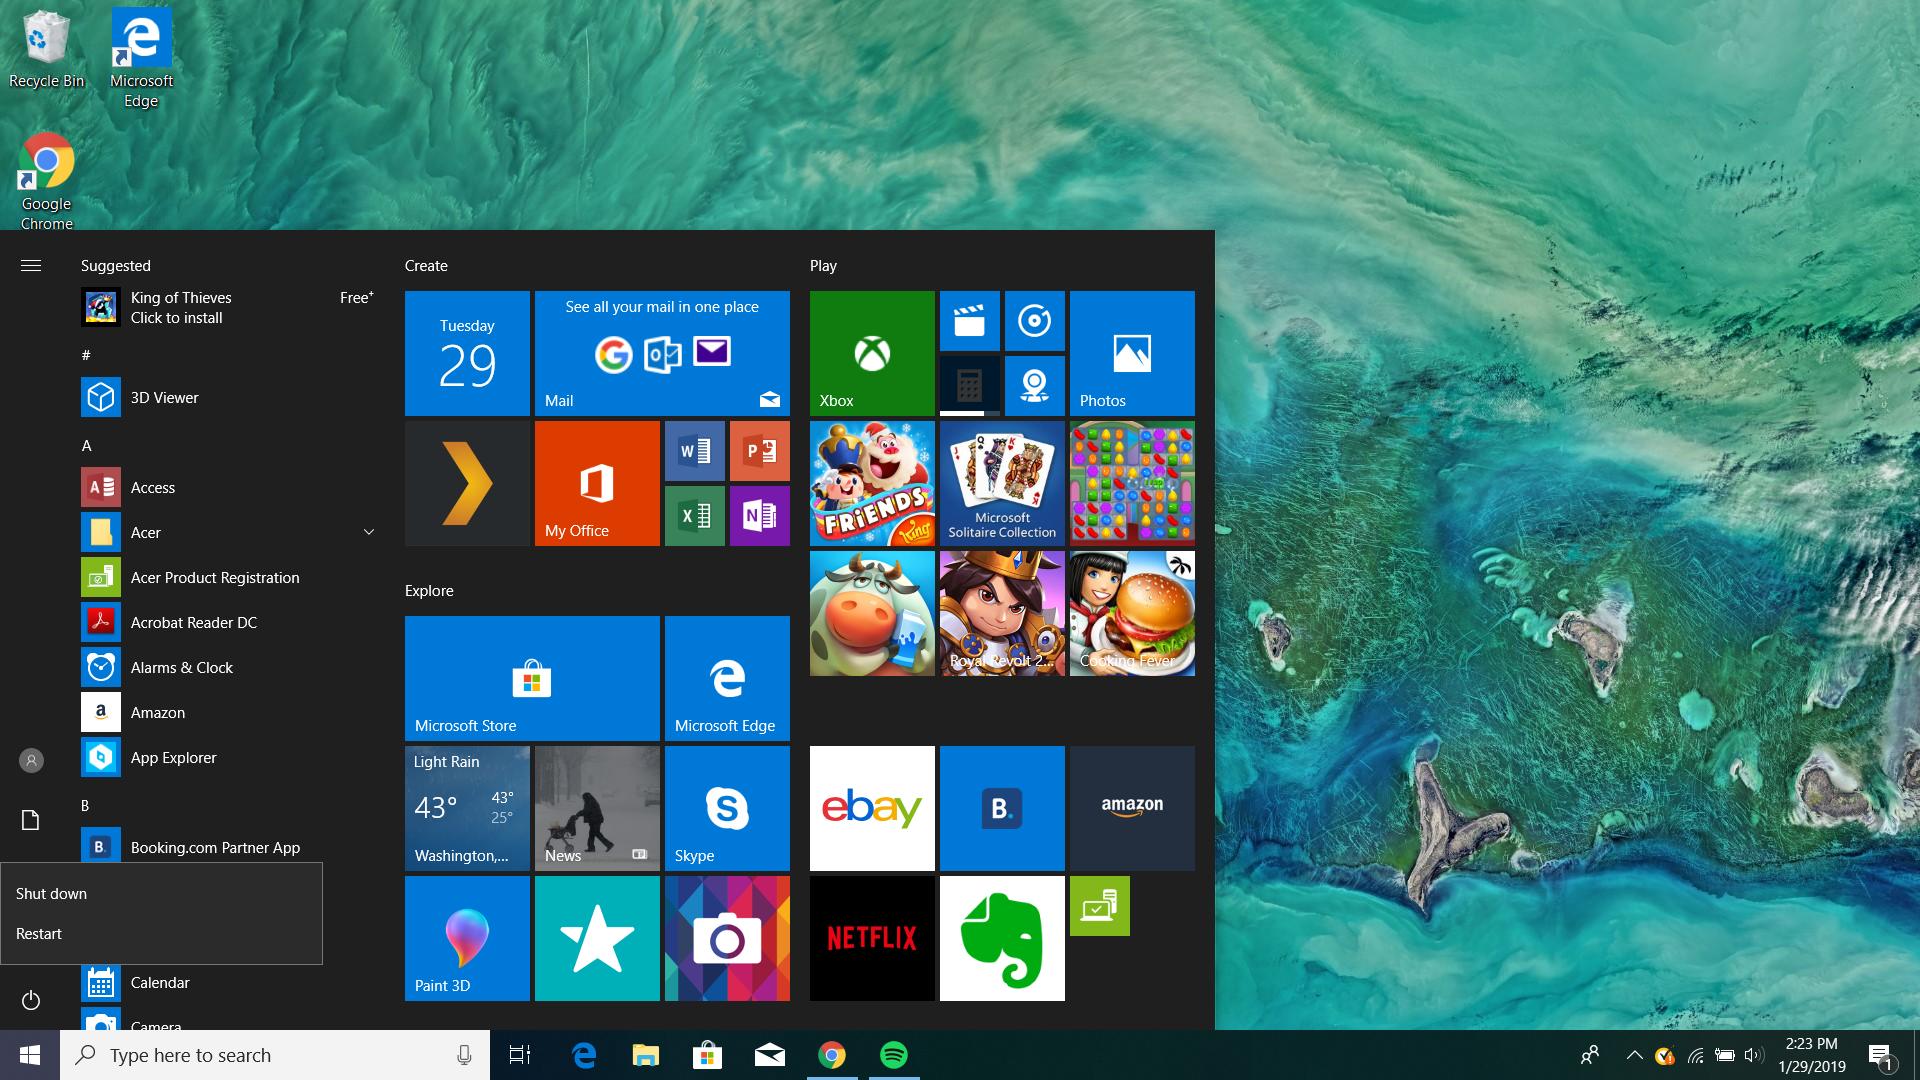 No Sleep Button in Start Menu After Windows 10 April 2019